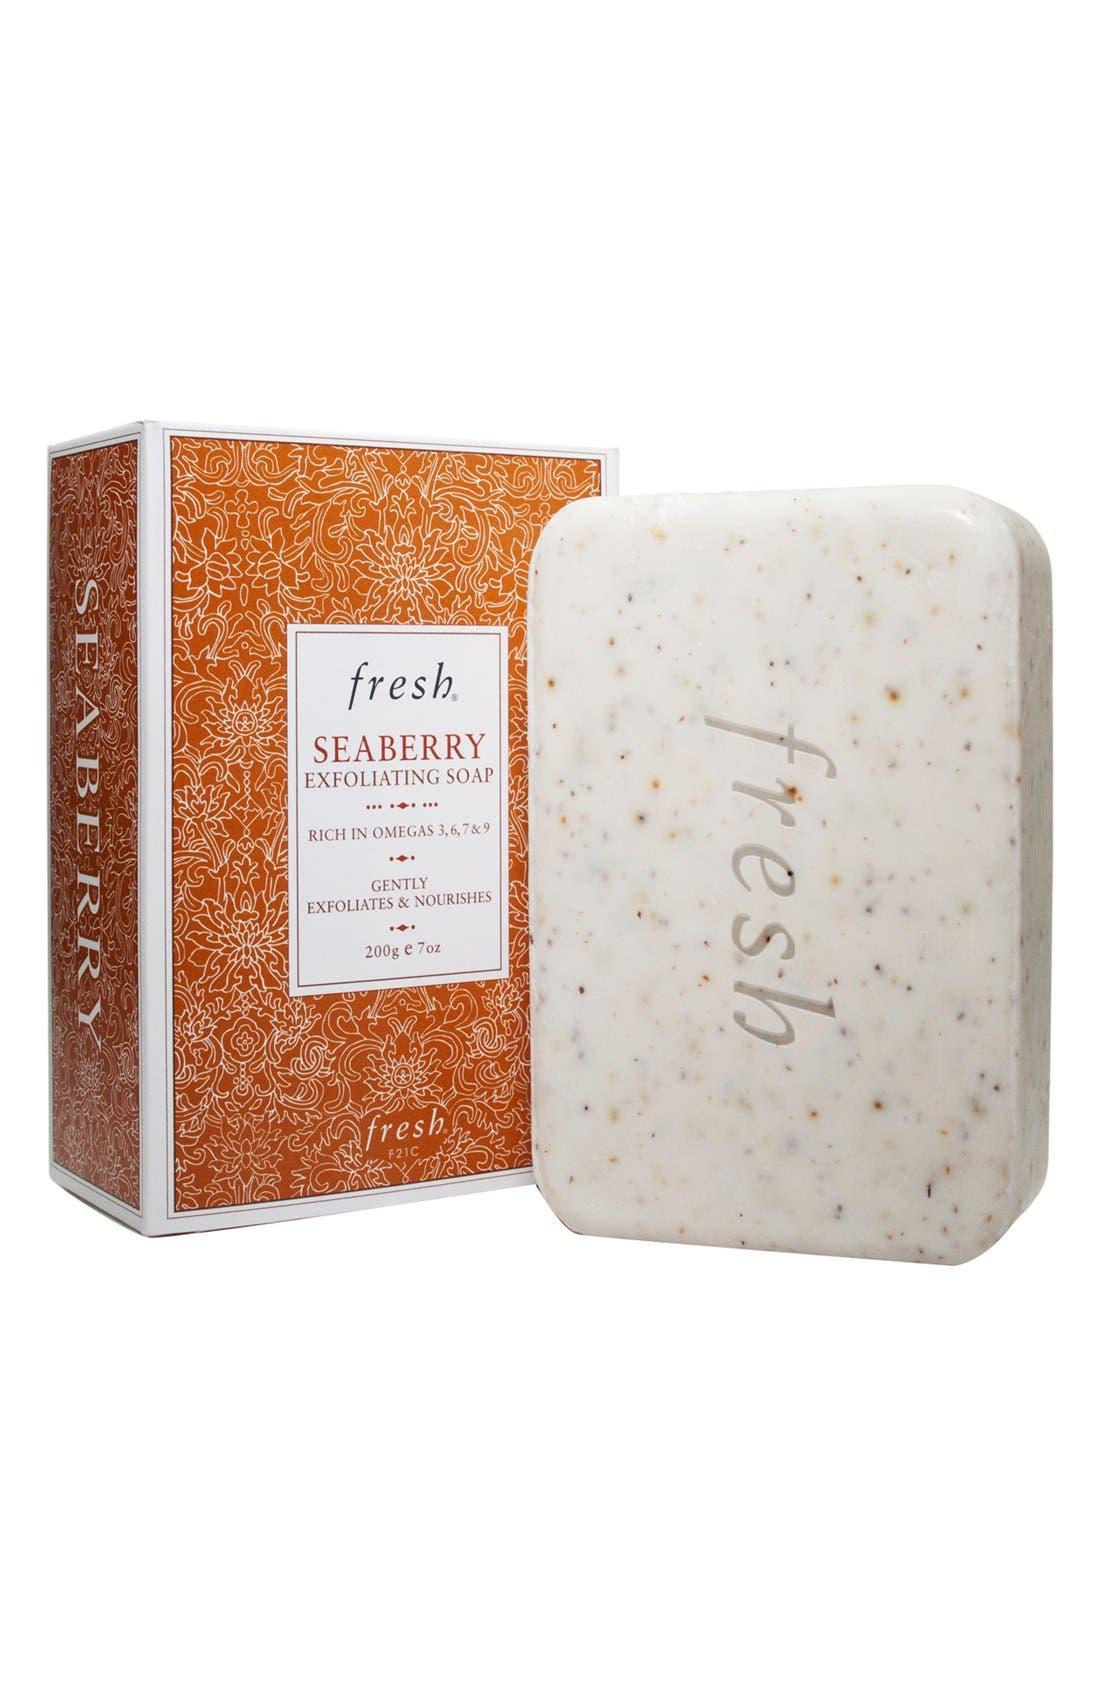 Fresh® Seaberry Exfoliating Soap